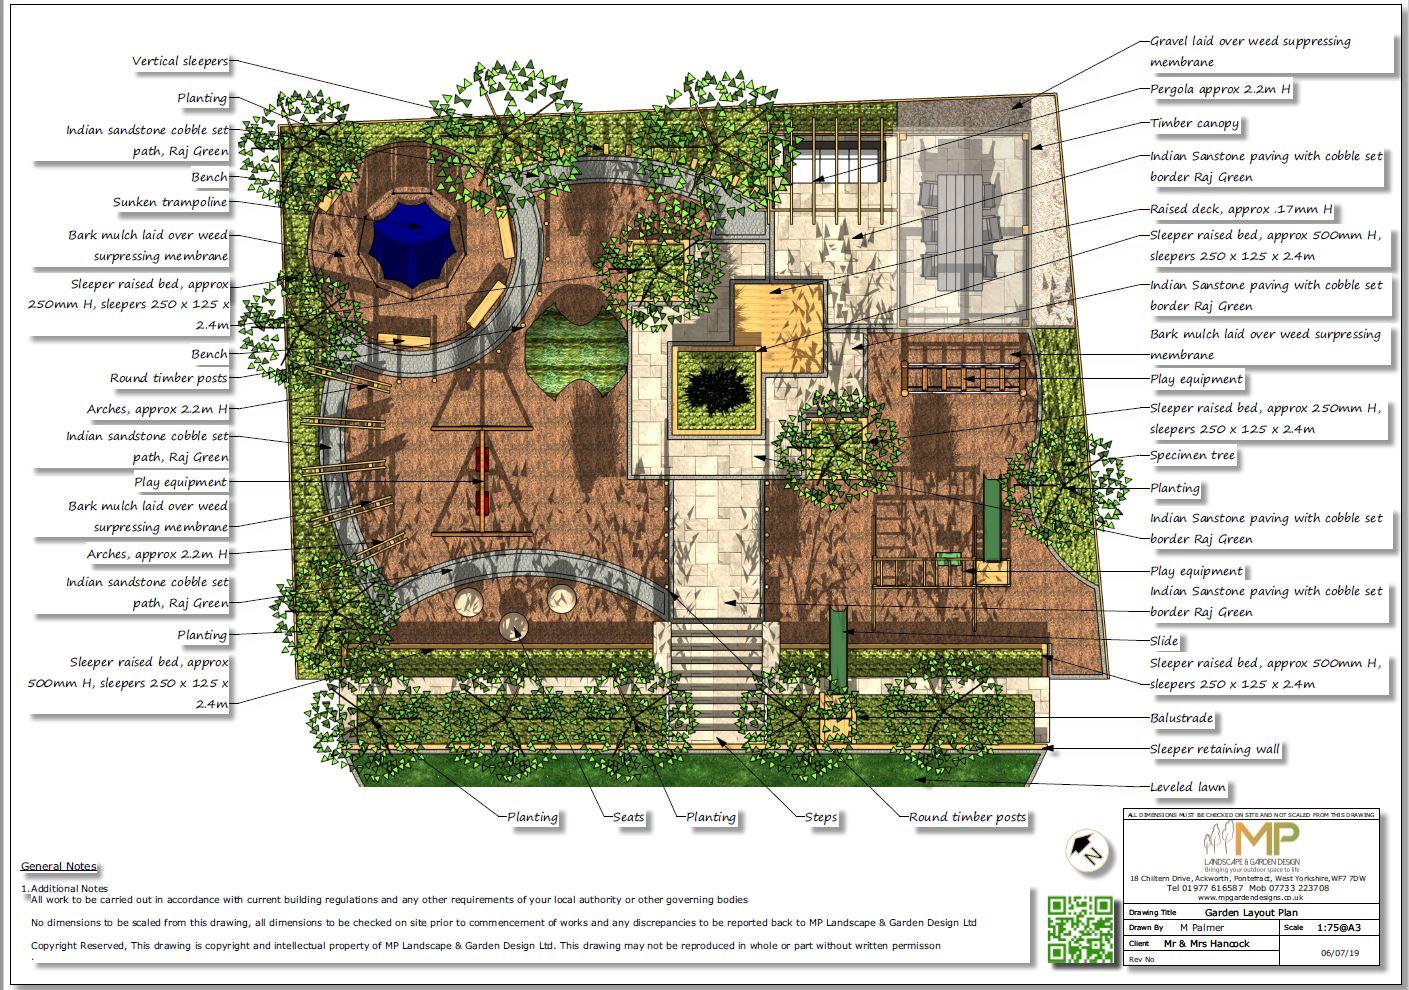 1, Childrens play garden, layout plan, Pontefract